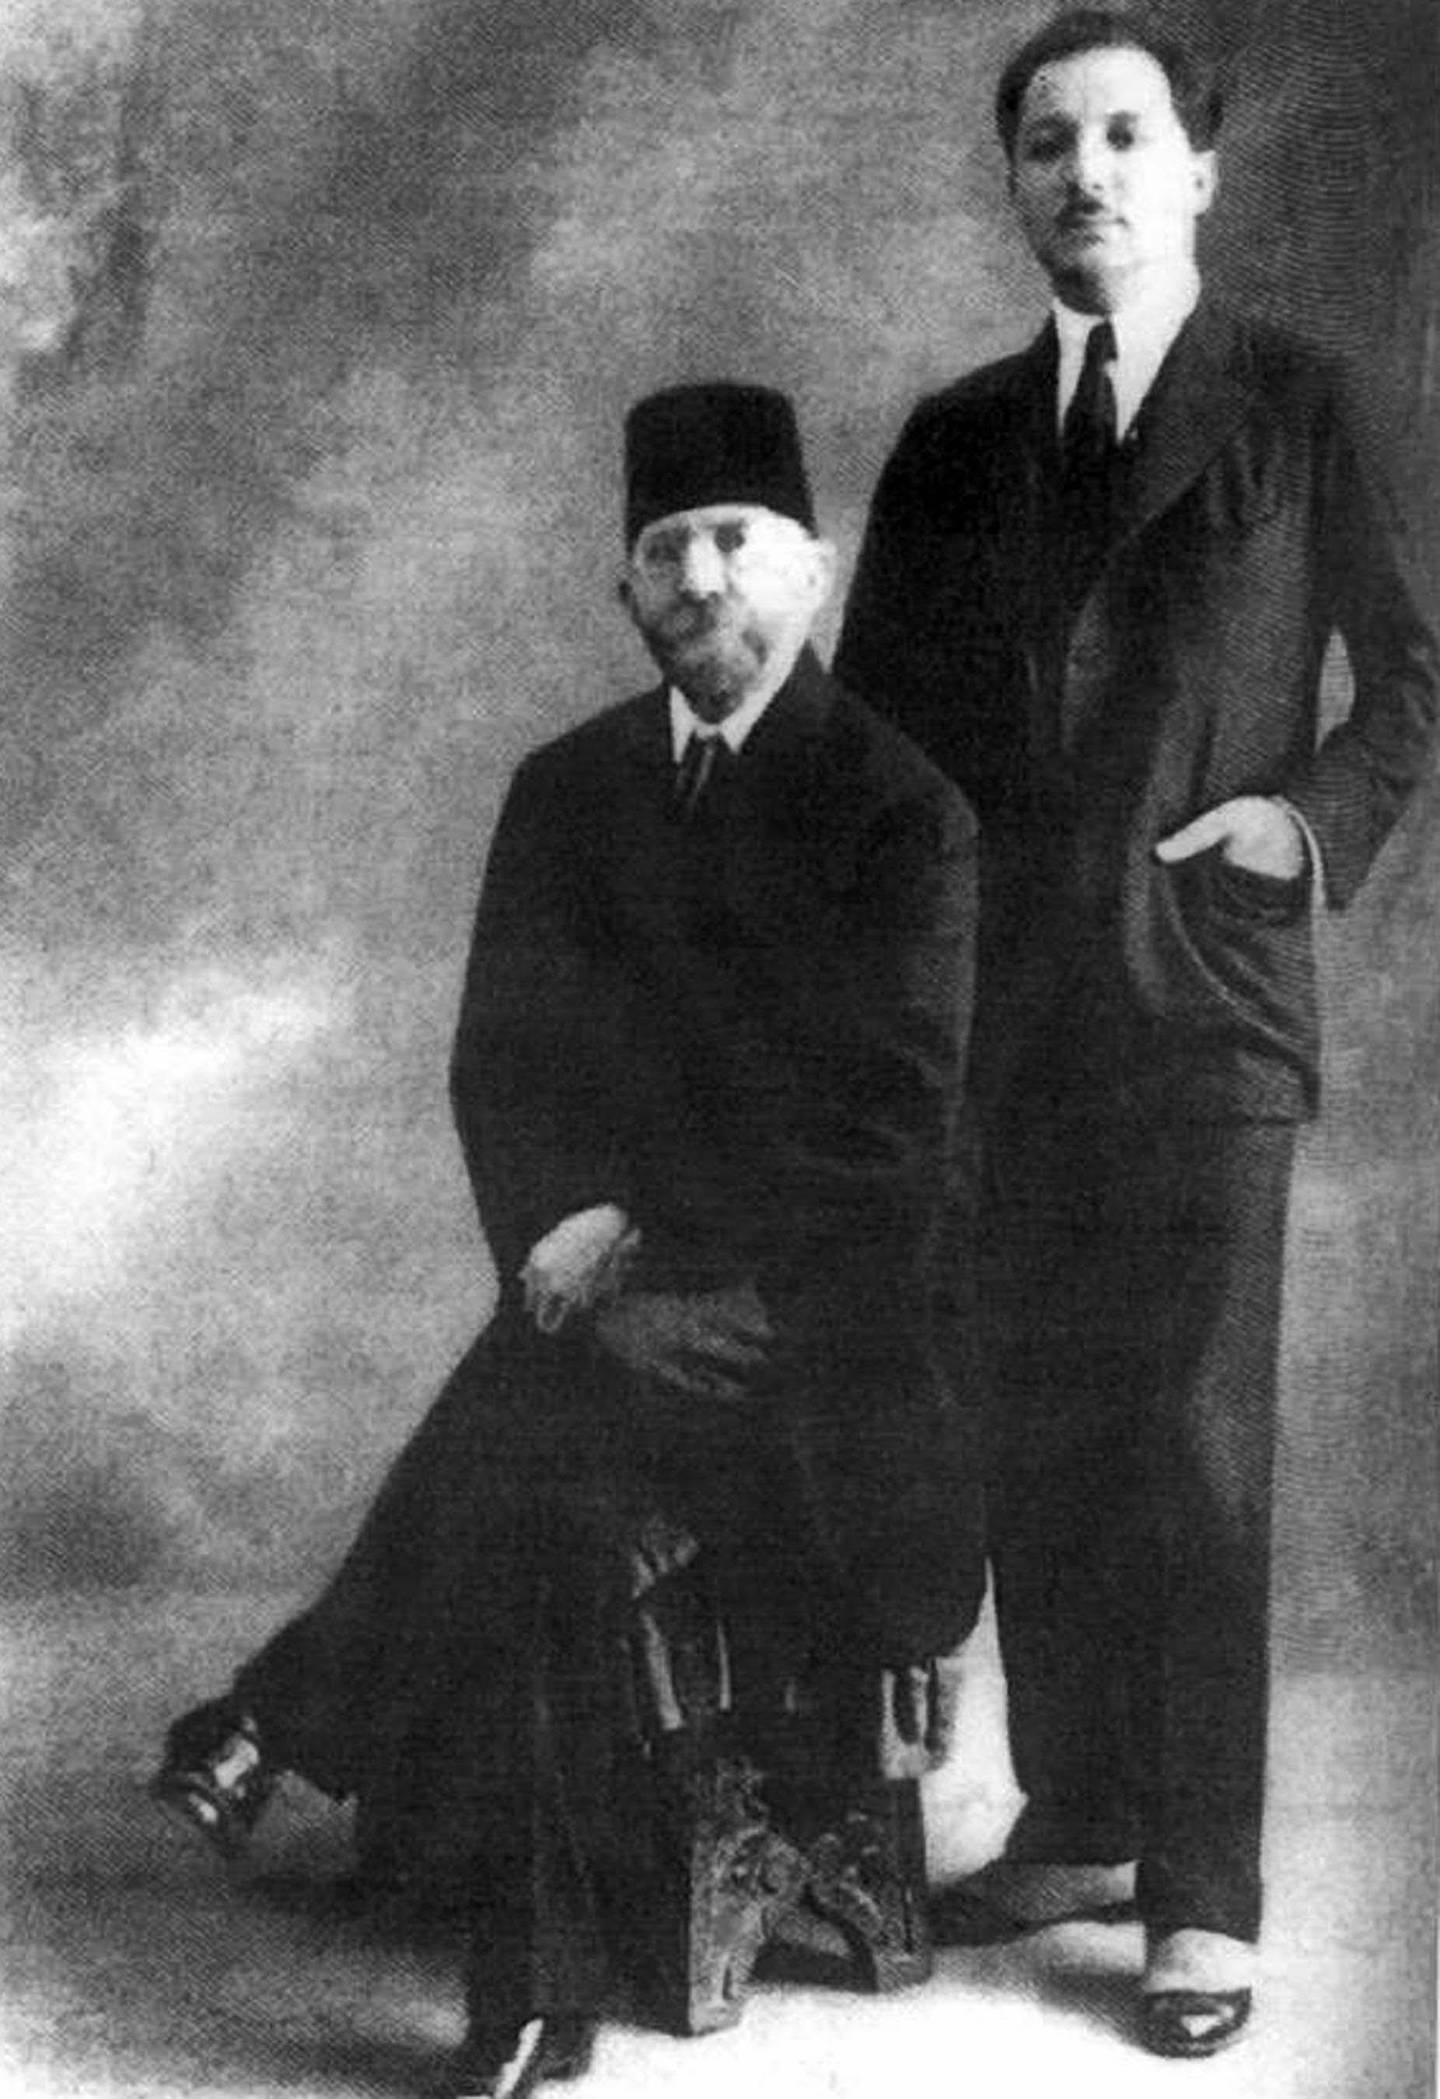 PAAM62 216 Riad al-Solh and his father Reda Al Solh - 1924. Alamy